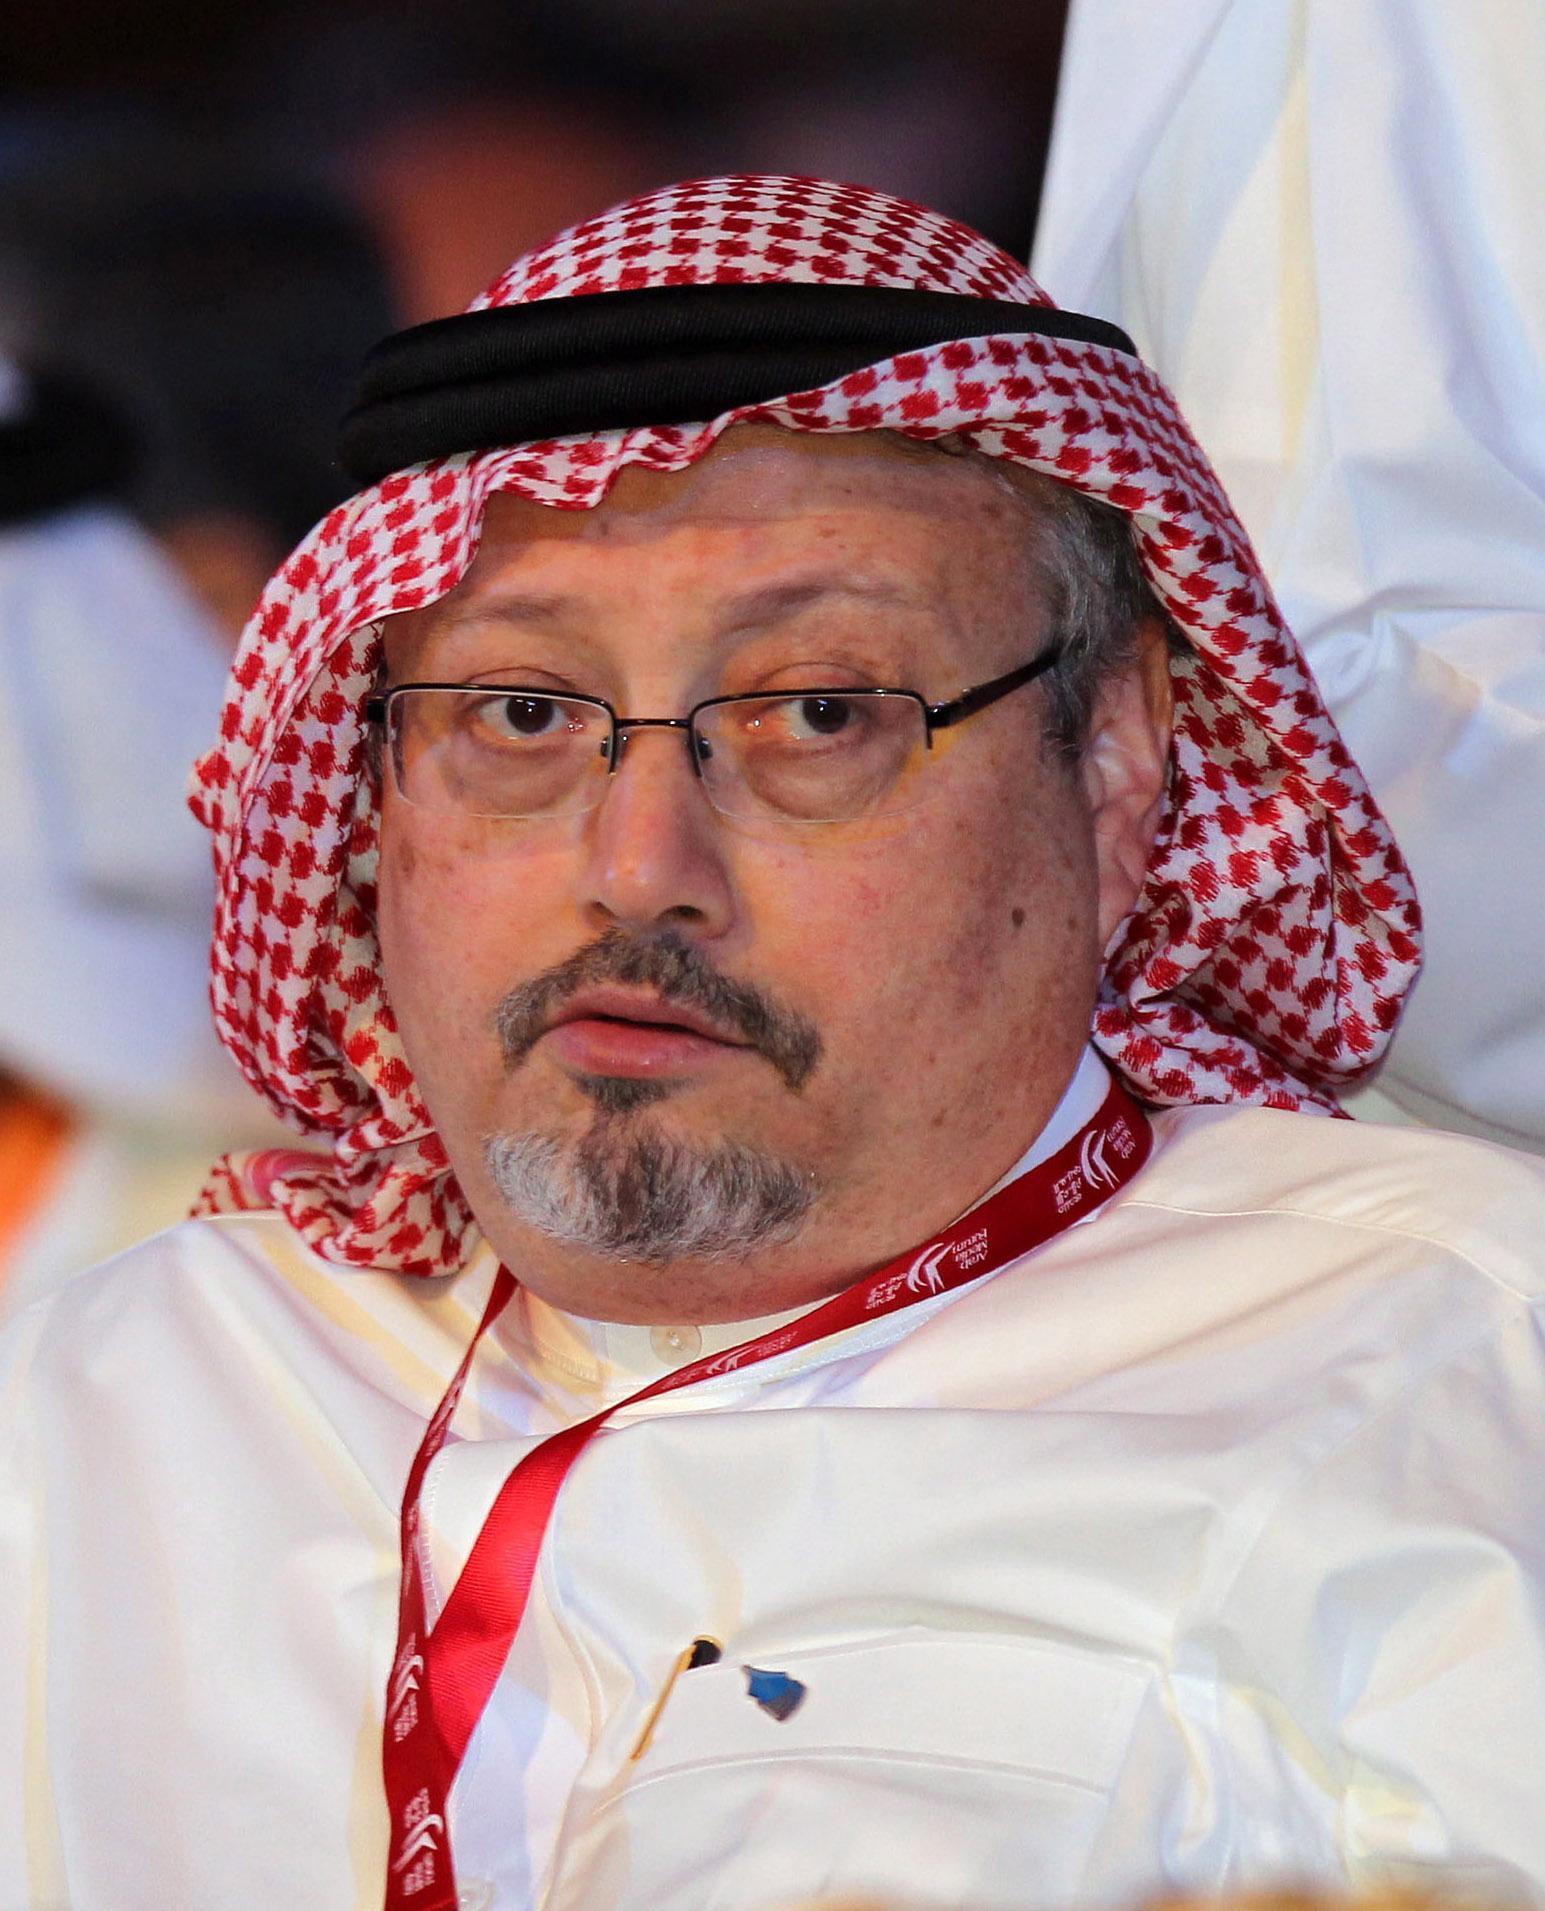 Journalist Jamal Khashoggi was murdered in the Saudi consulate in Istanbul